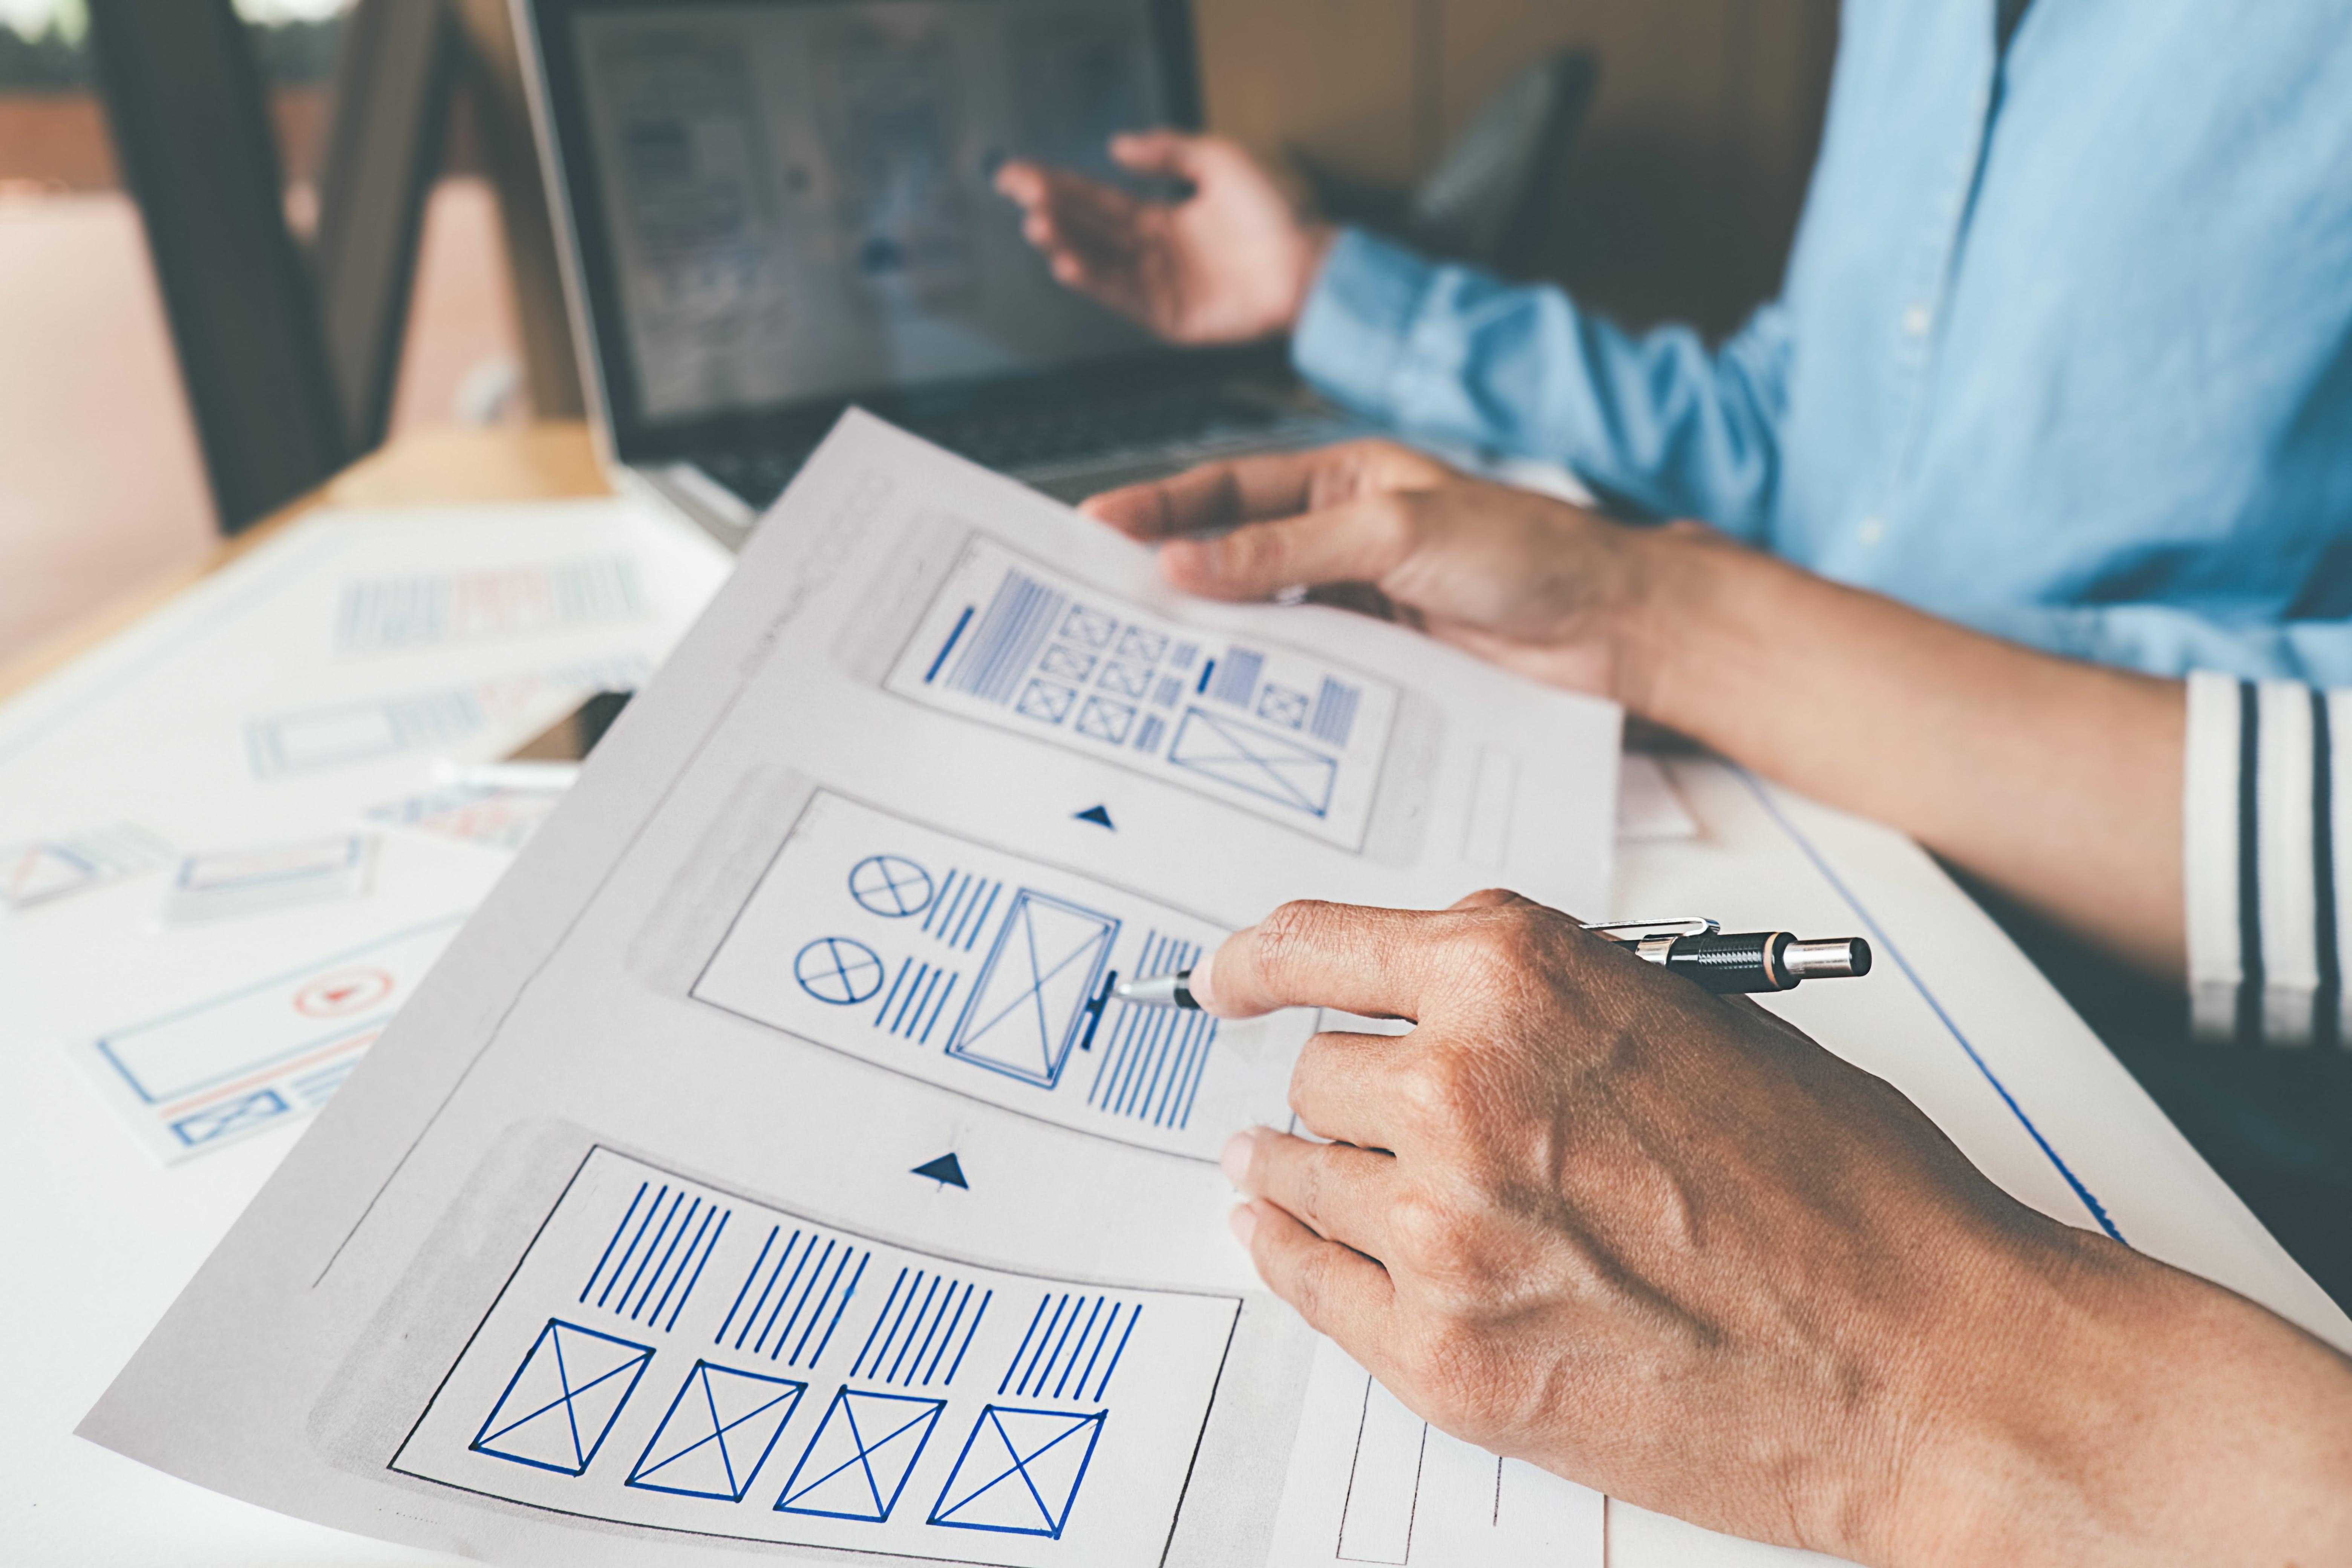 A designer holding some wireframes